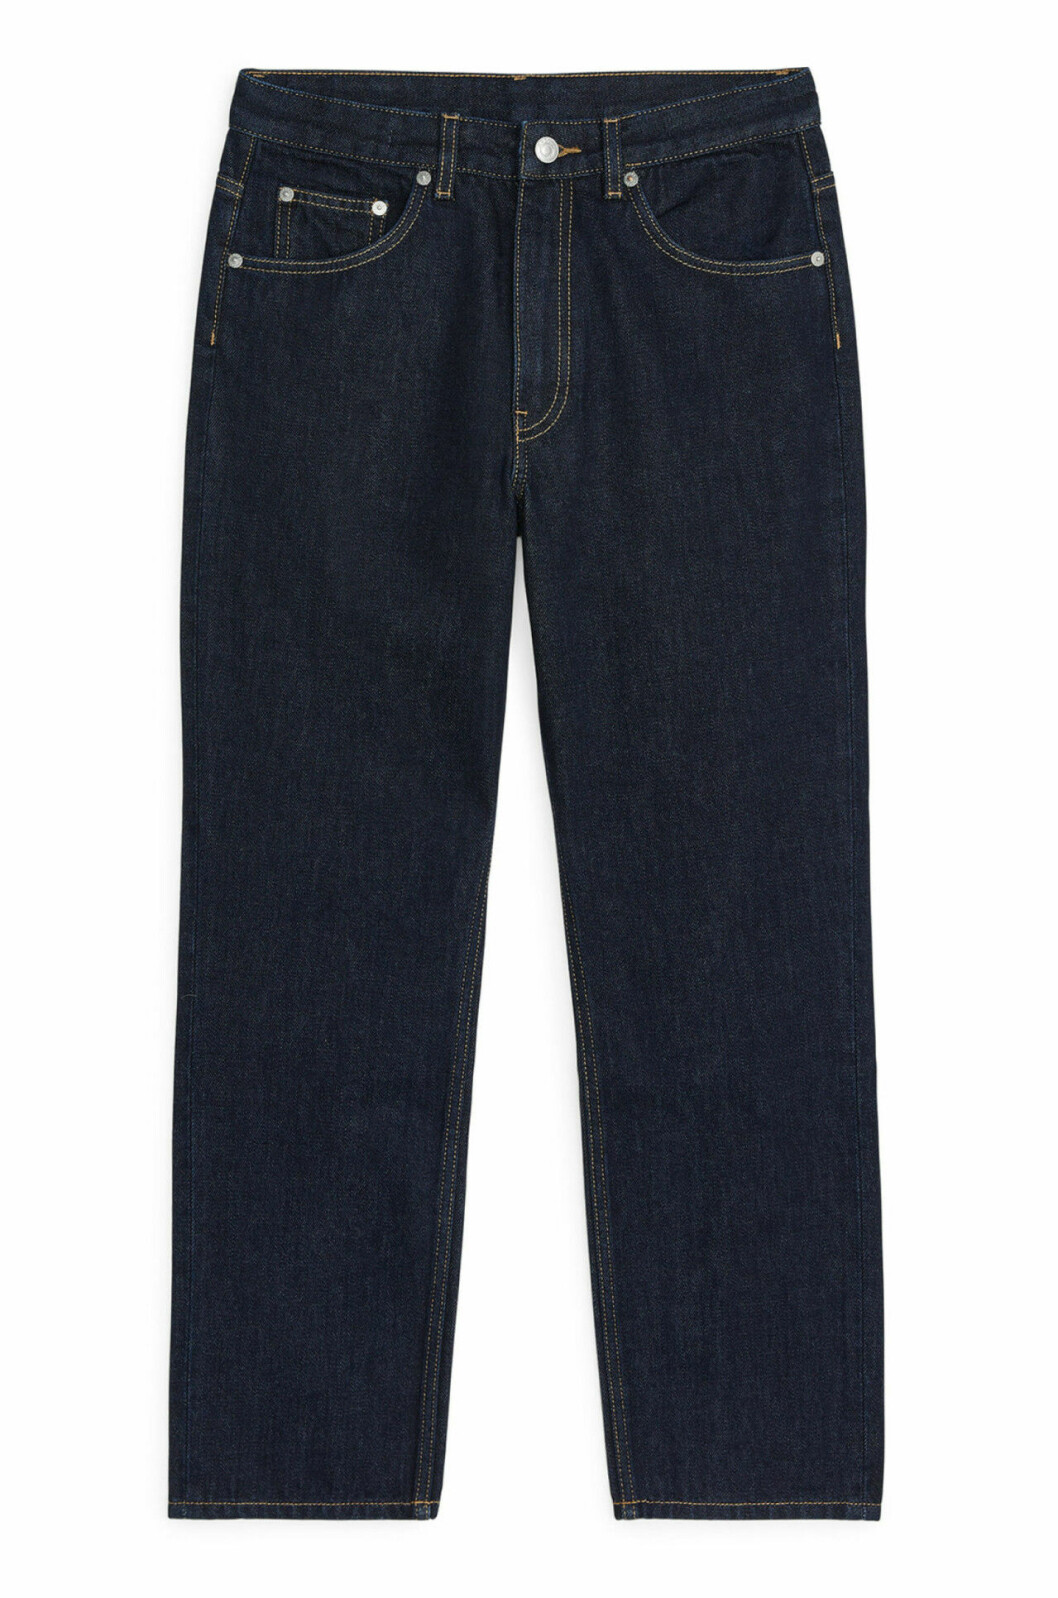 Mörka jeans till våren 2019 i rak modell